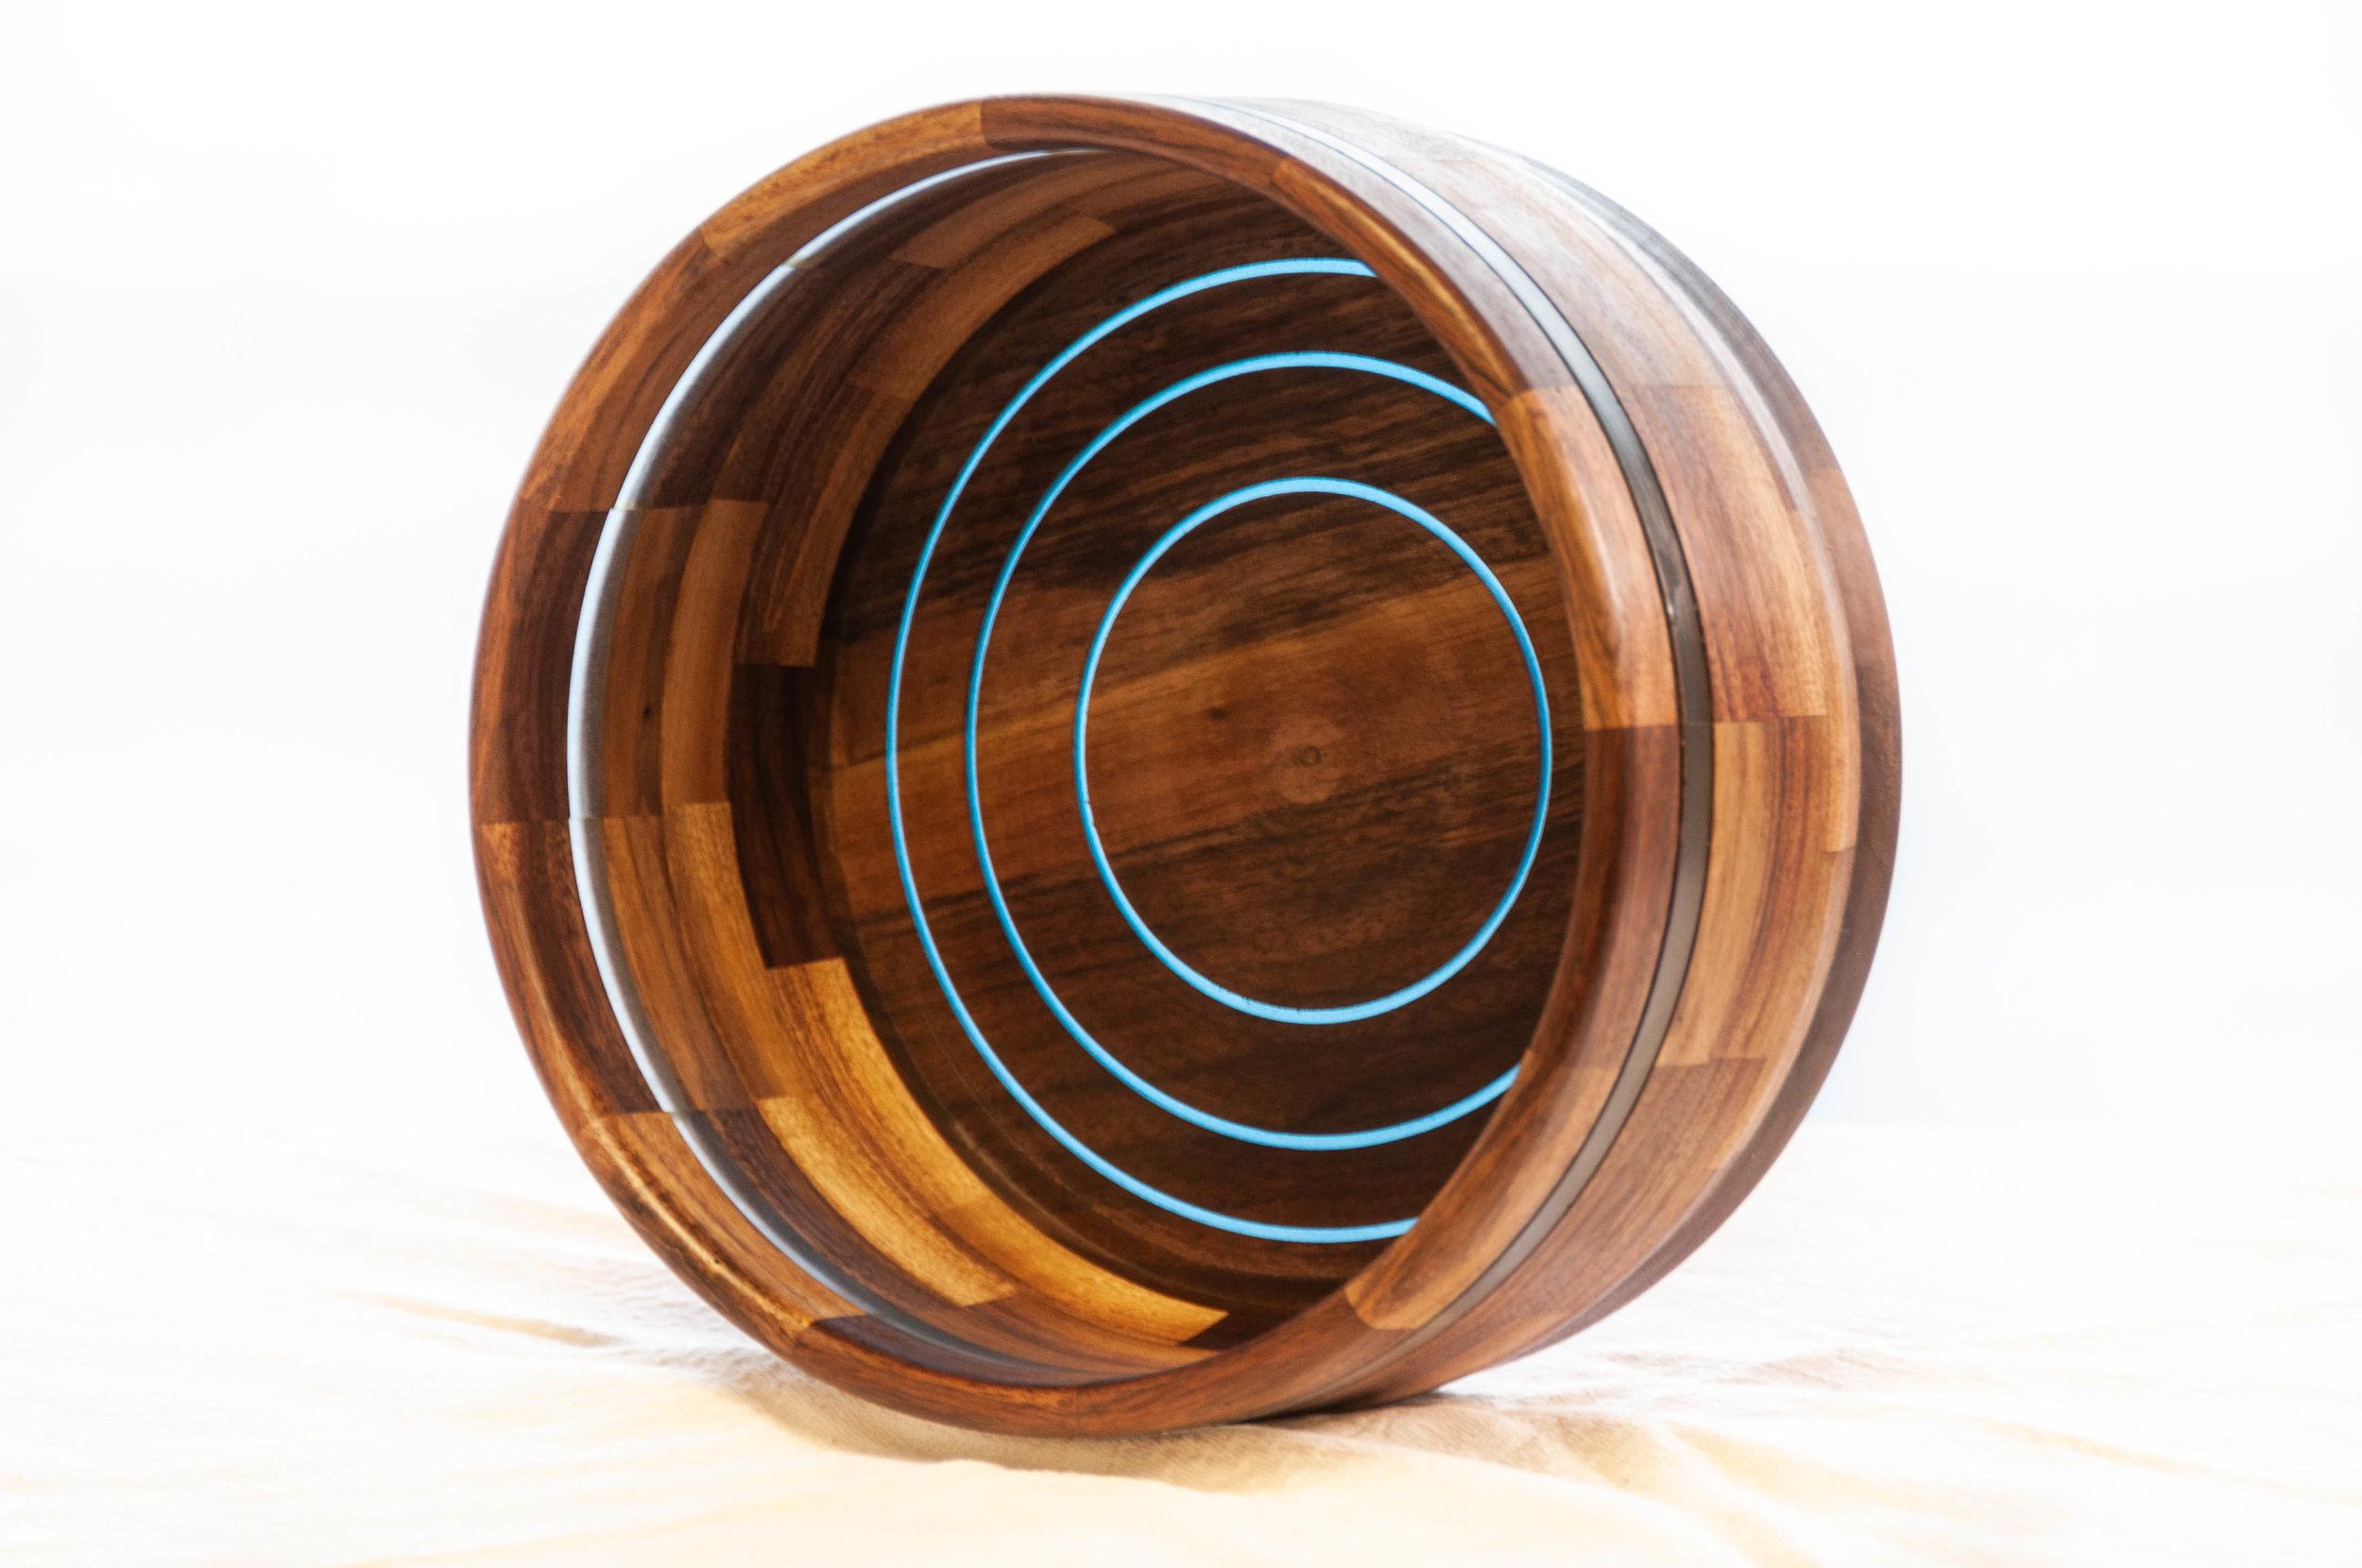 RJC Wood Creations - WoodResin Bowl Blue 2.jpg